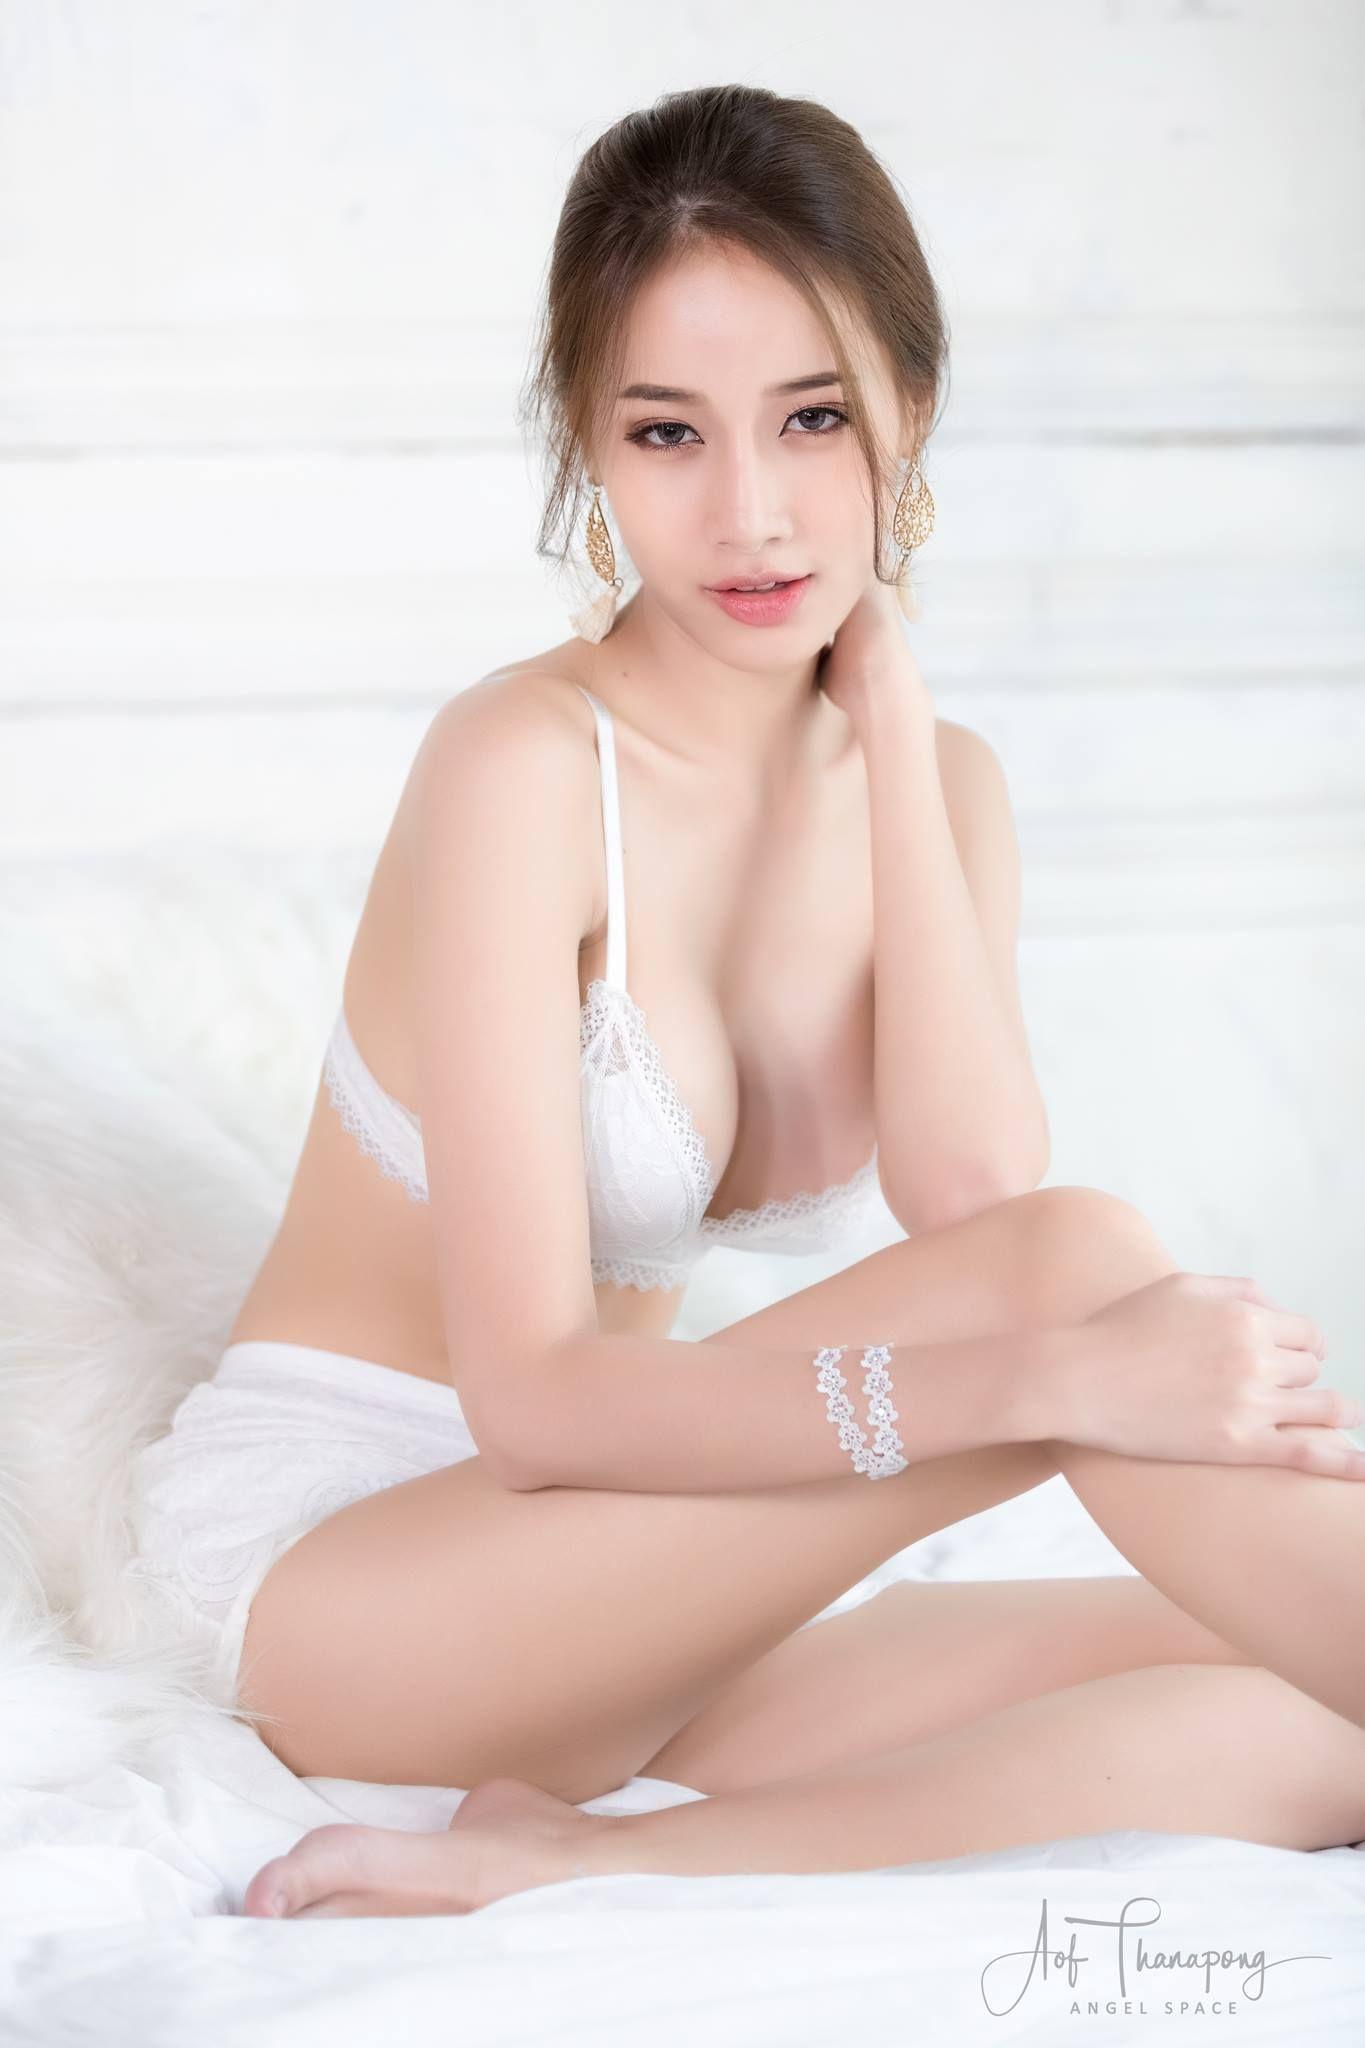 Erotic photoes of thai girls